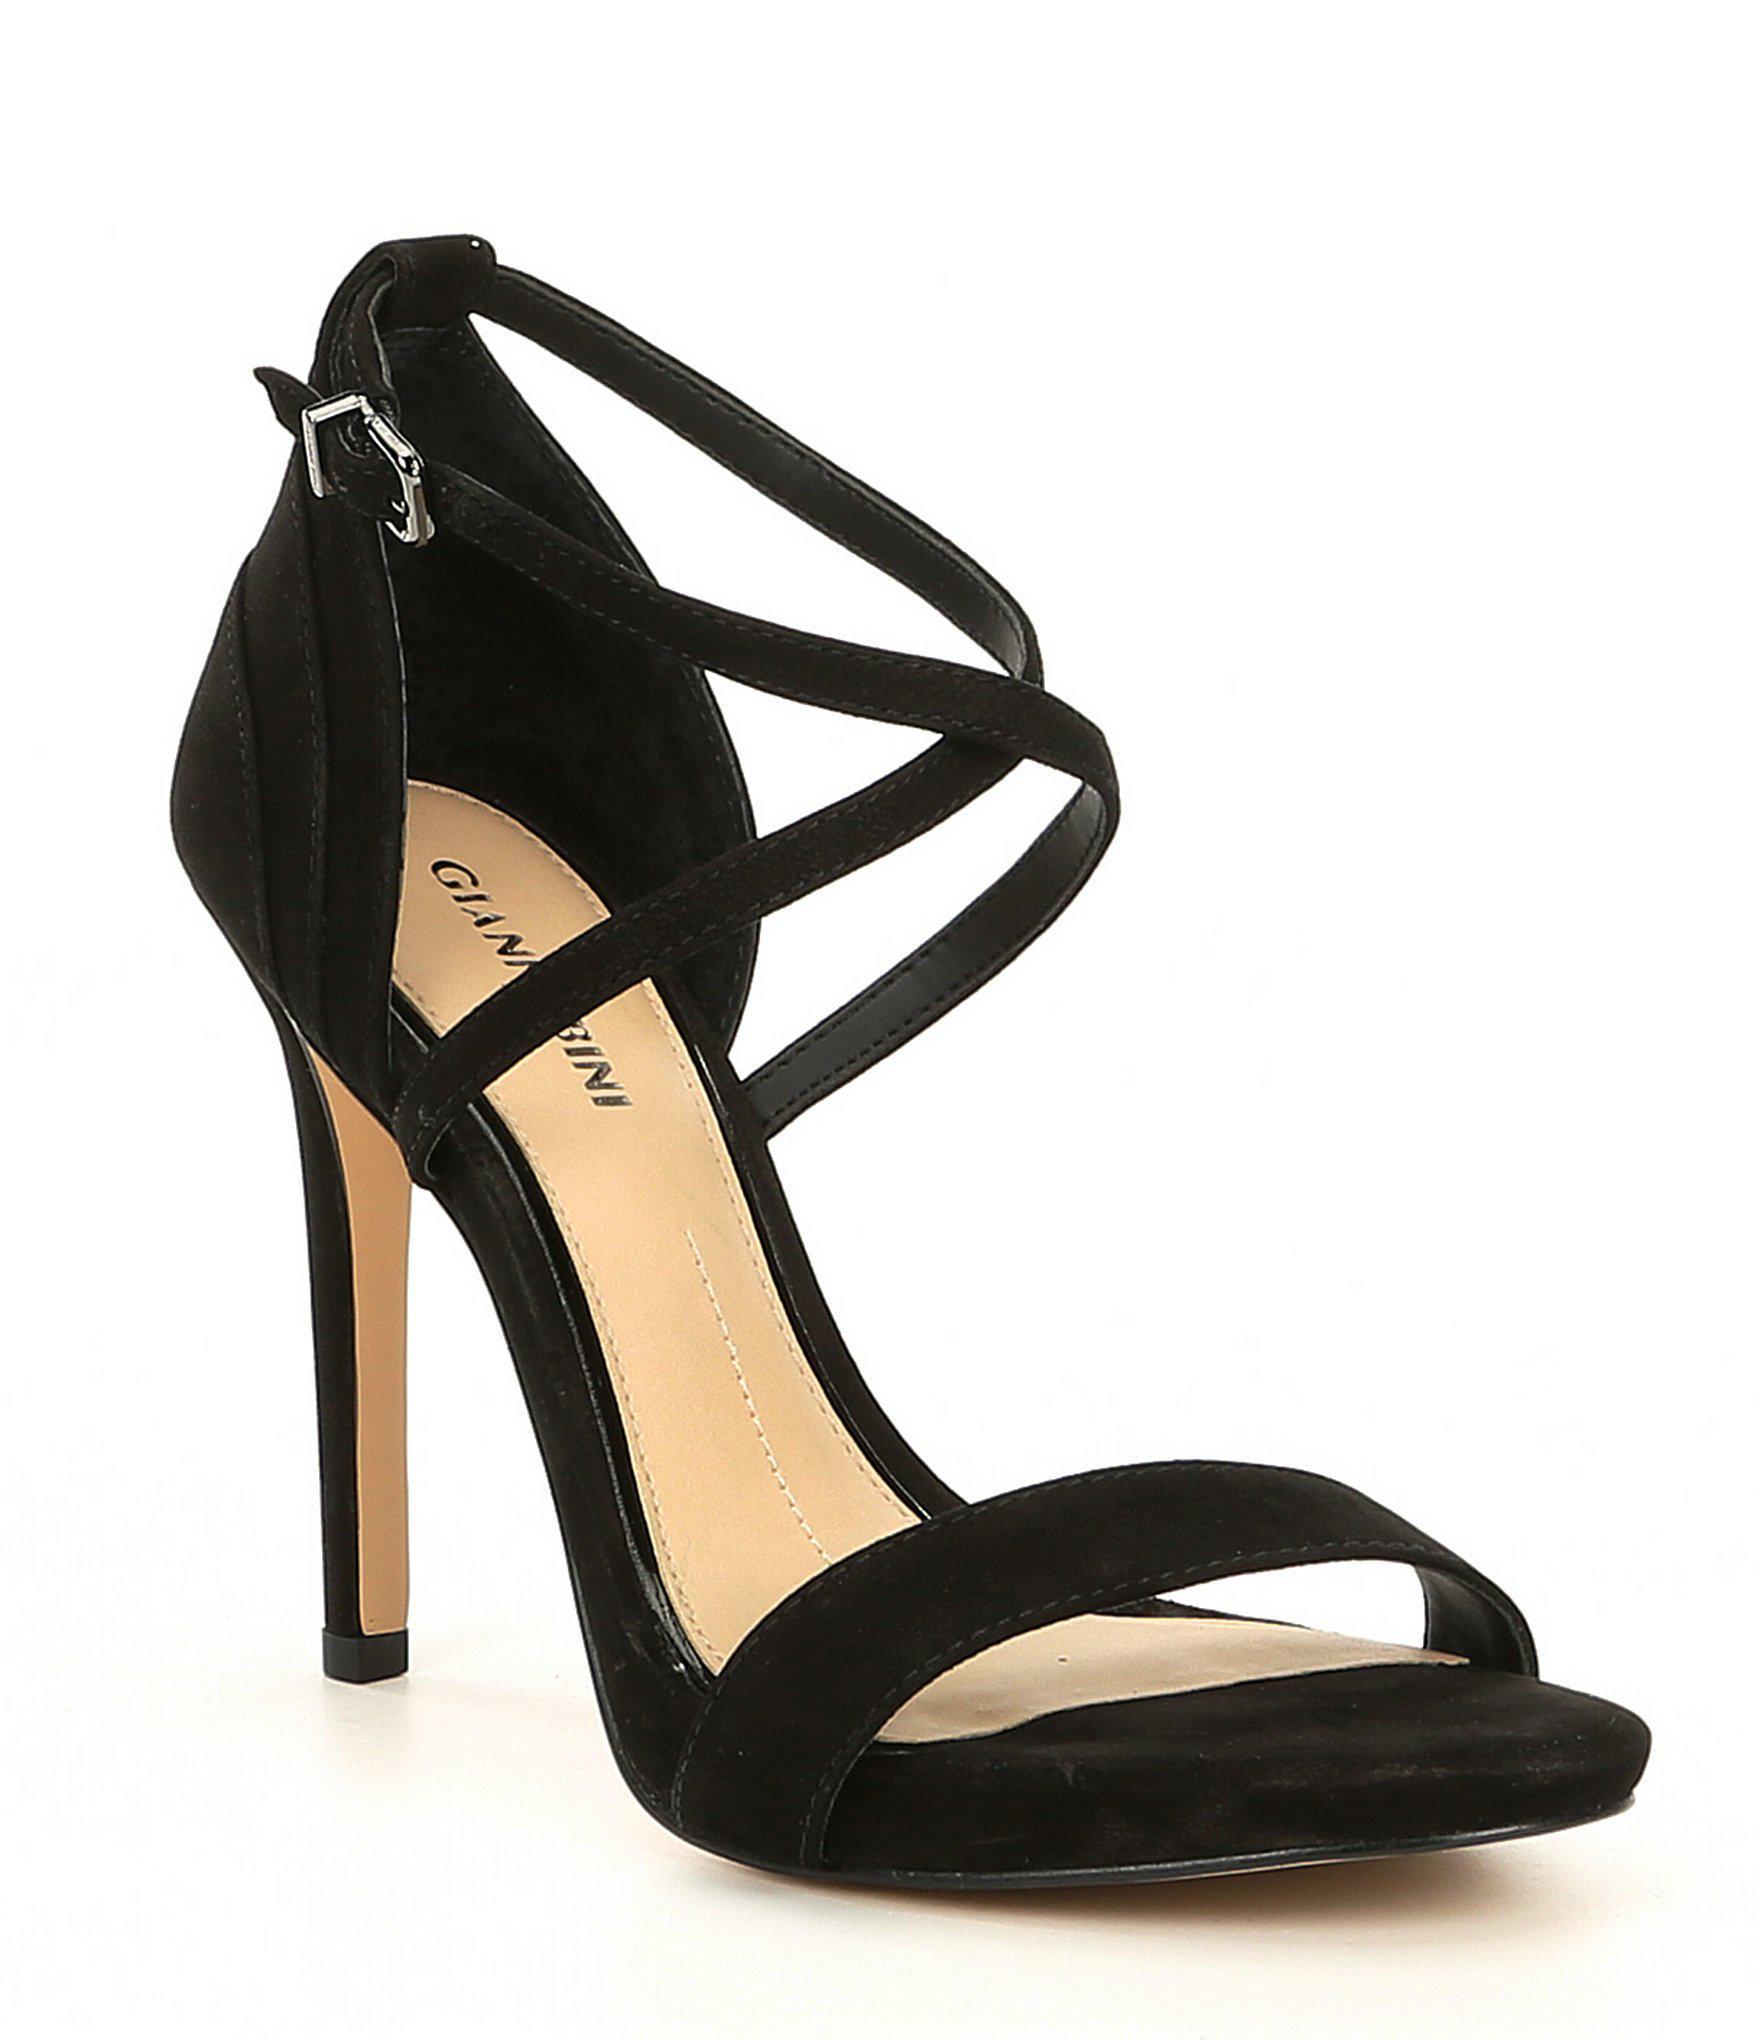 a552792325d Lyst - Gianni Bini Zandee Xband Strap Nubuck Dress Sandals in Black